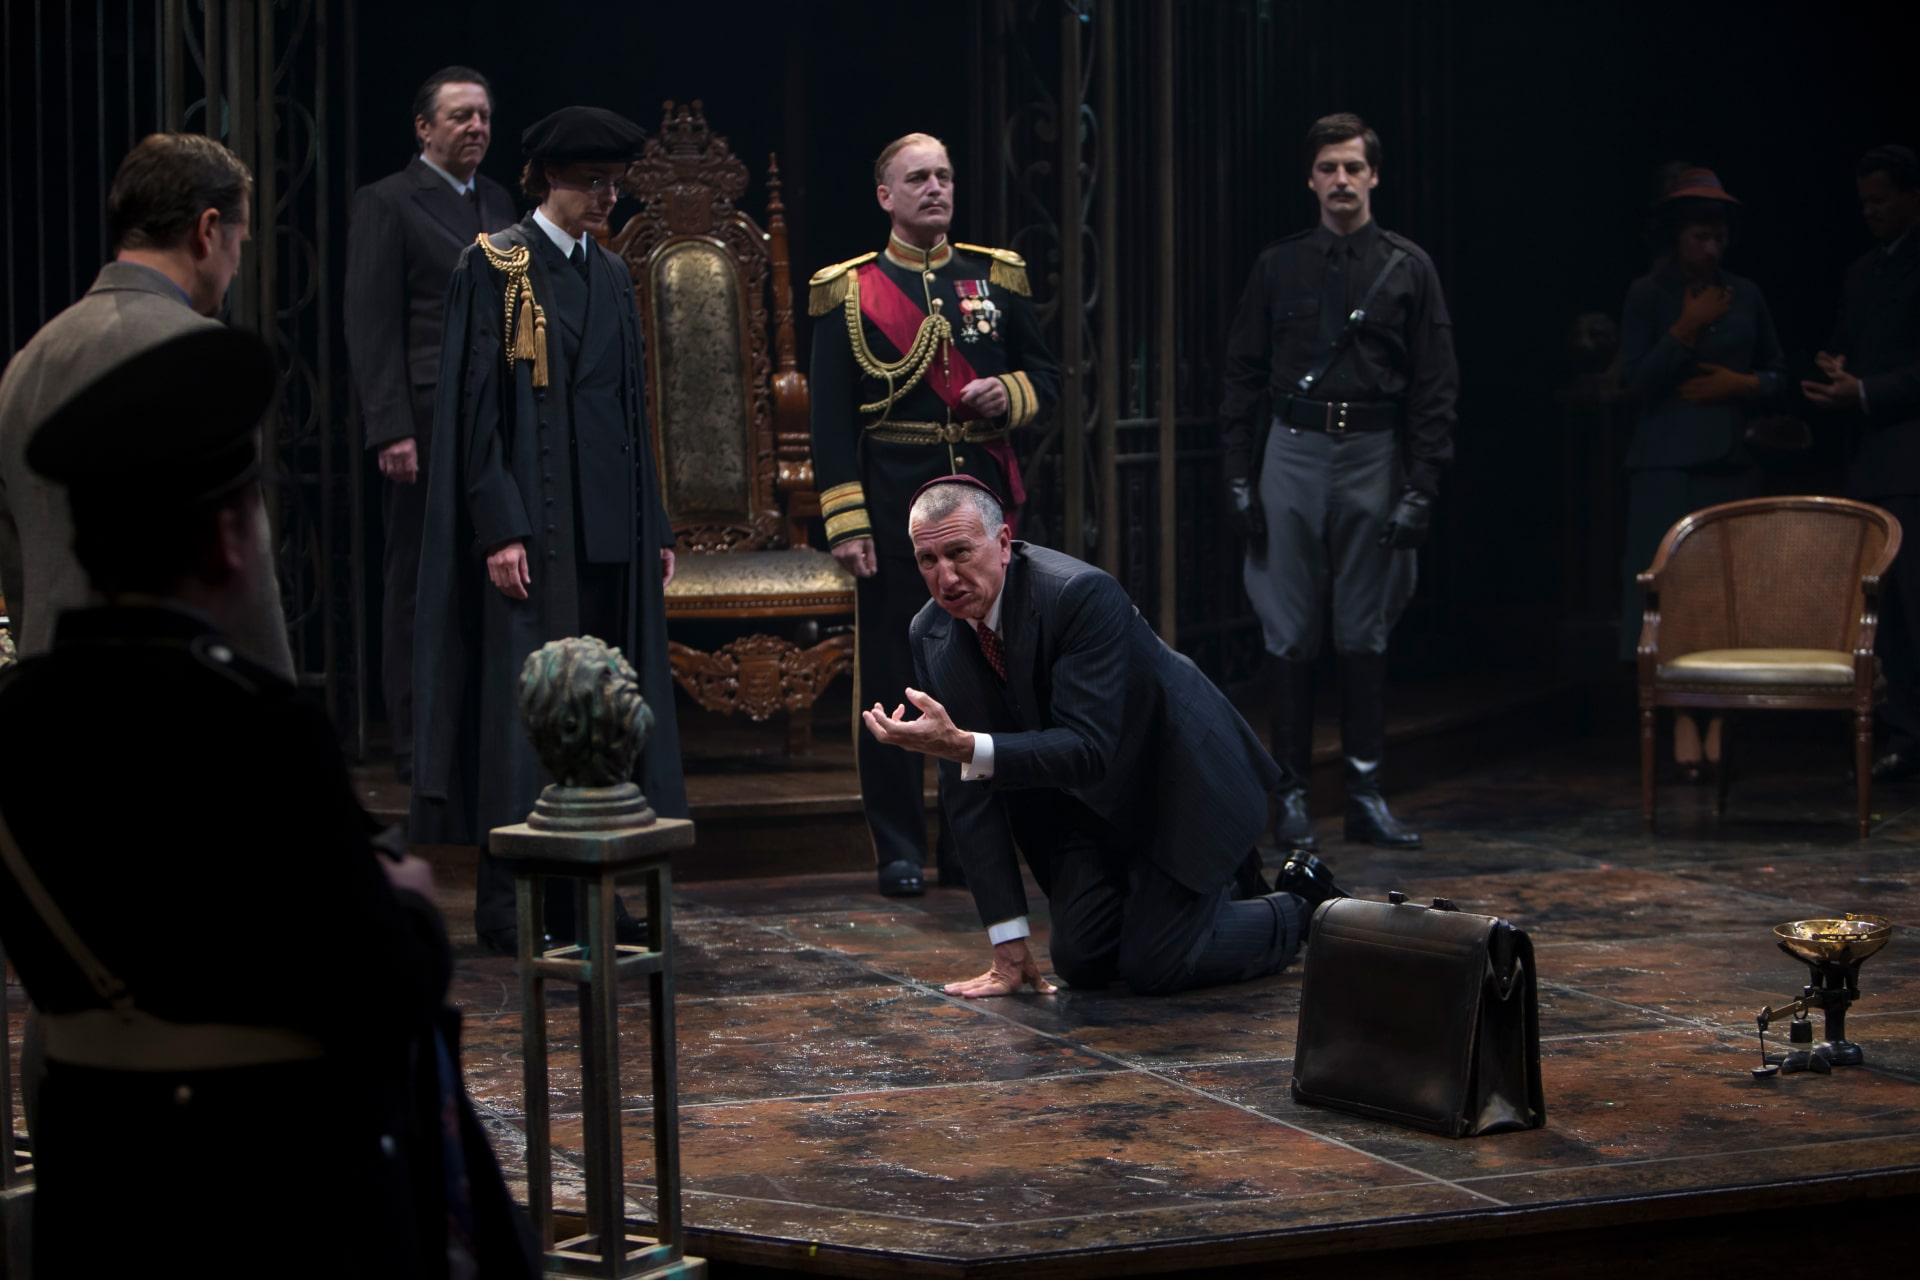 Distraught man in suit and yarmulke kneels pleading before standing figures on brown marbled stage.